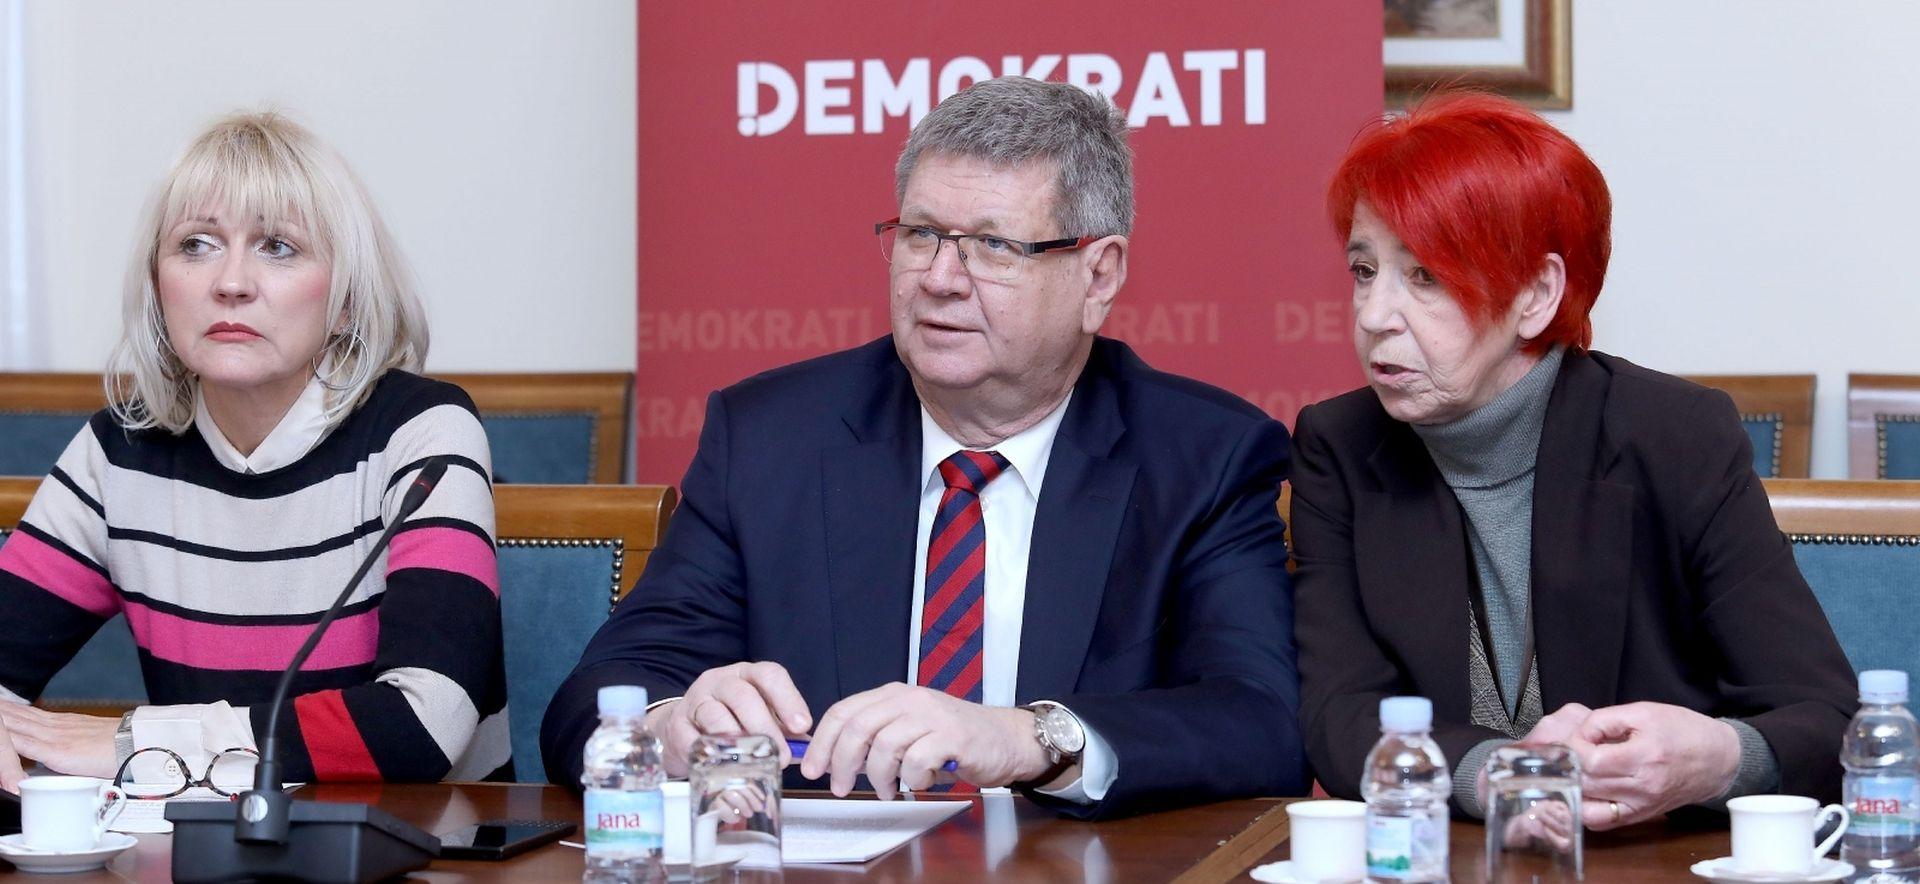 Demokrati Miranda Mrsića uskoro u Amsterdamskoj koaliciji